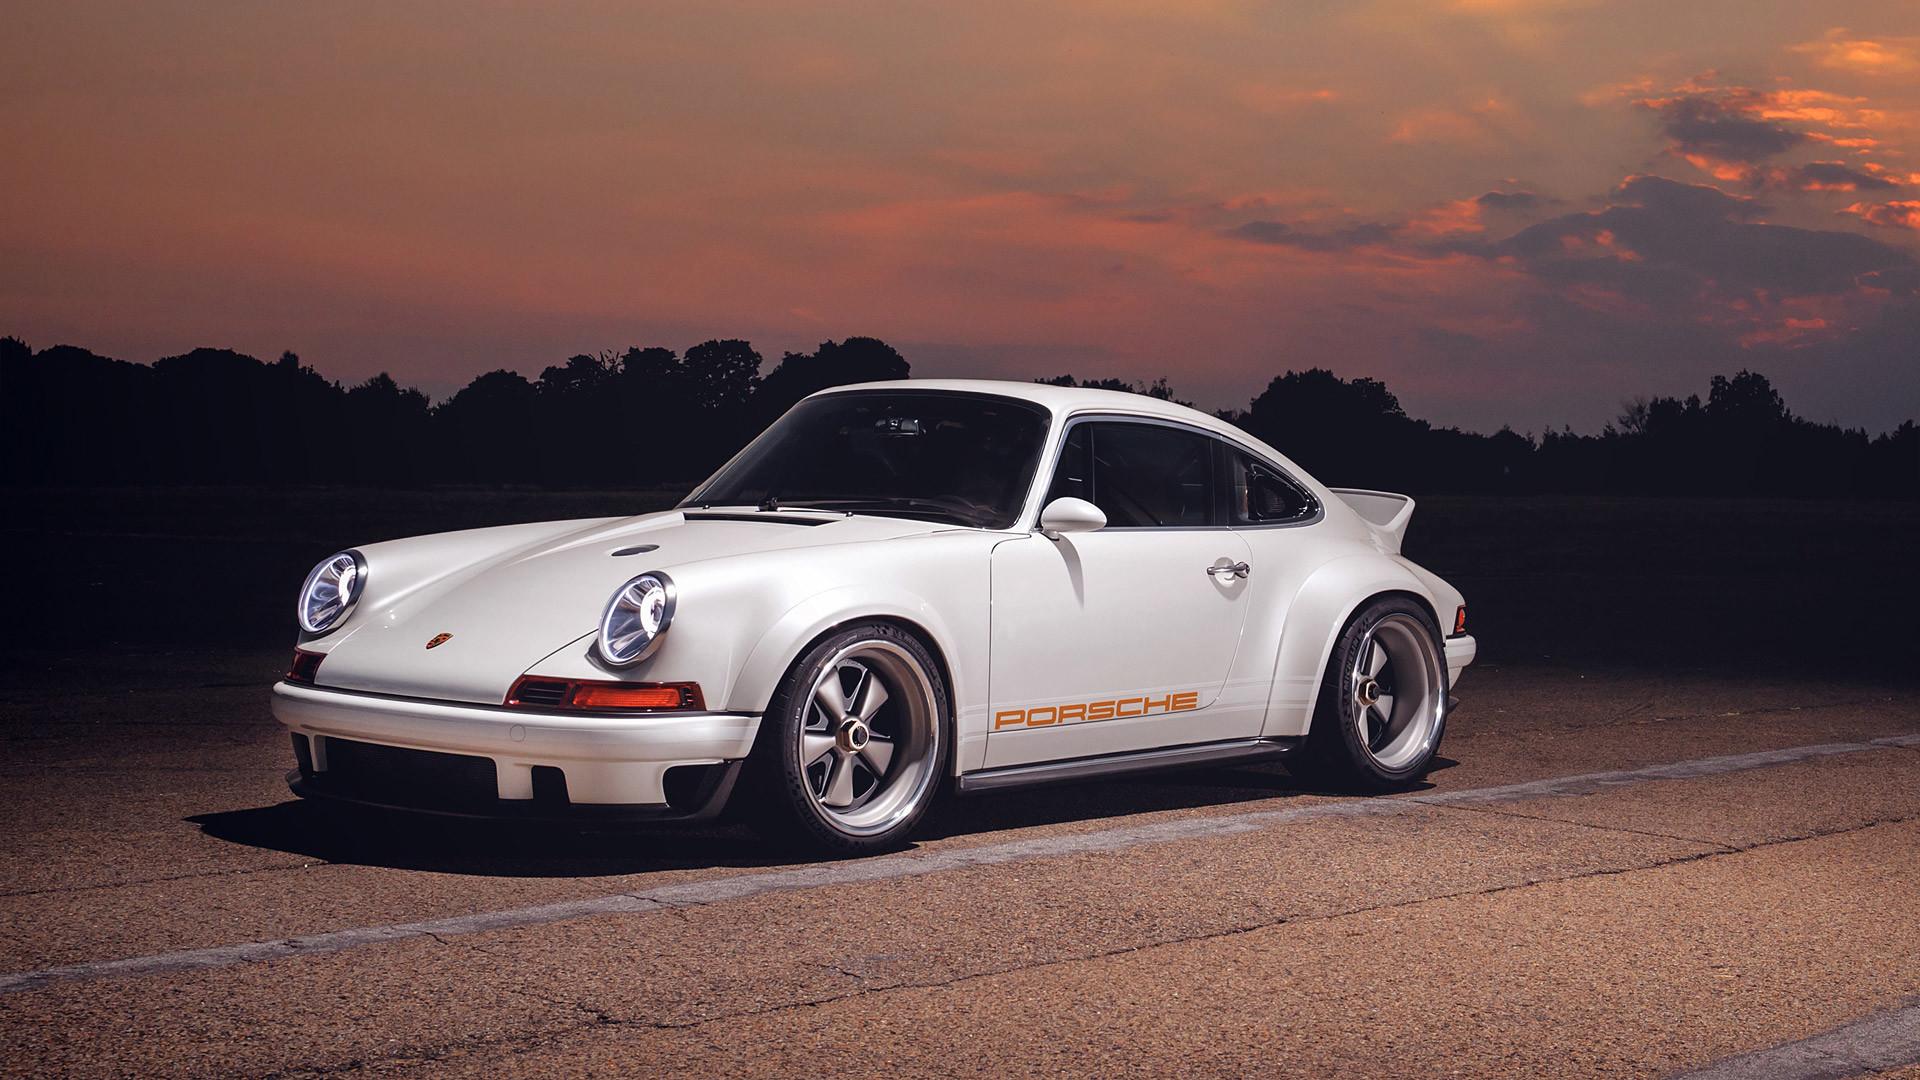 2018 Singer Dls Picture - Singer Williams Porsche - HD Wallpaper